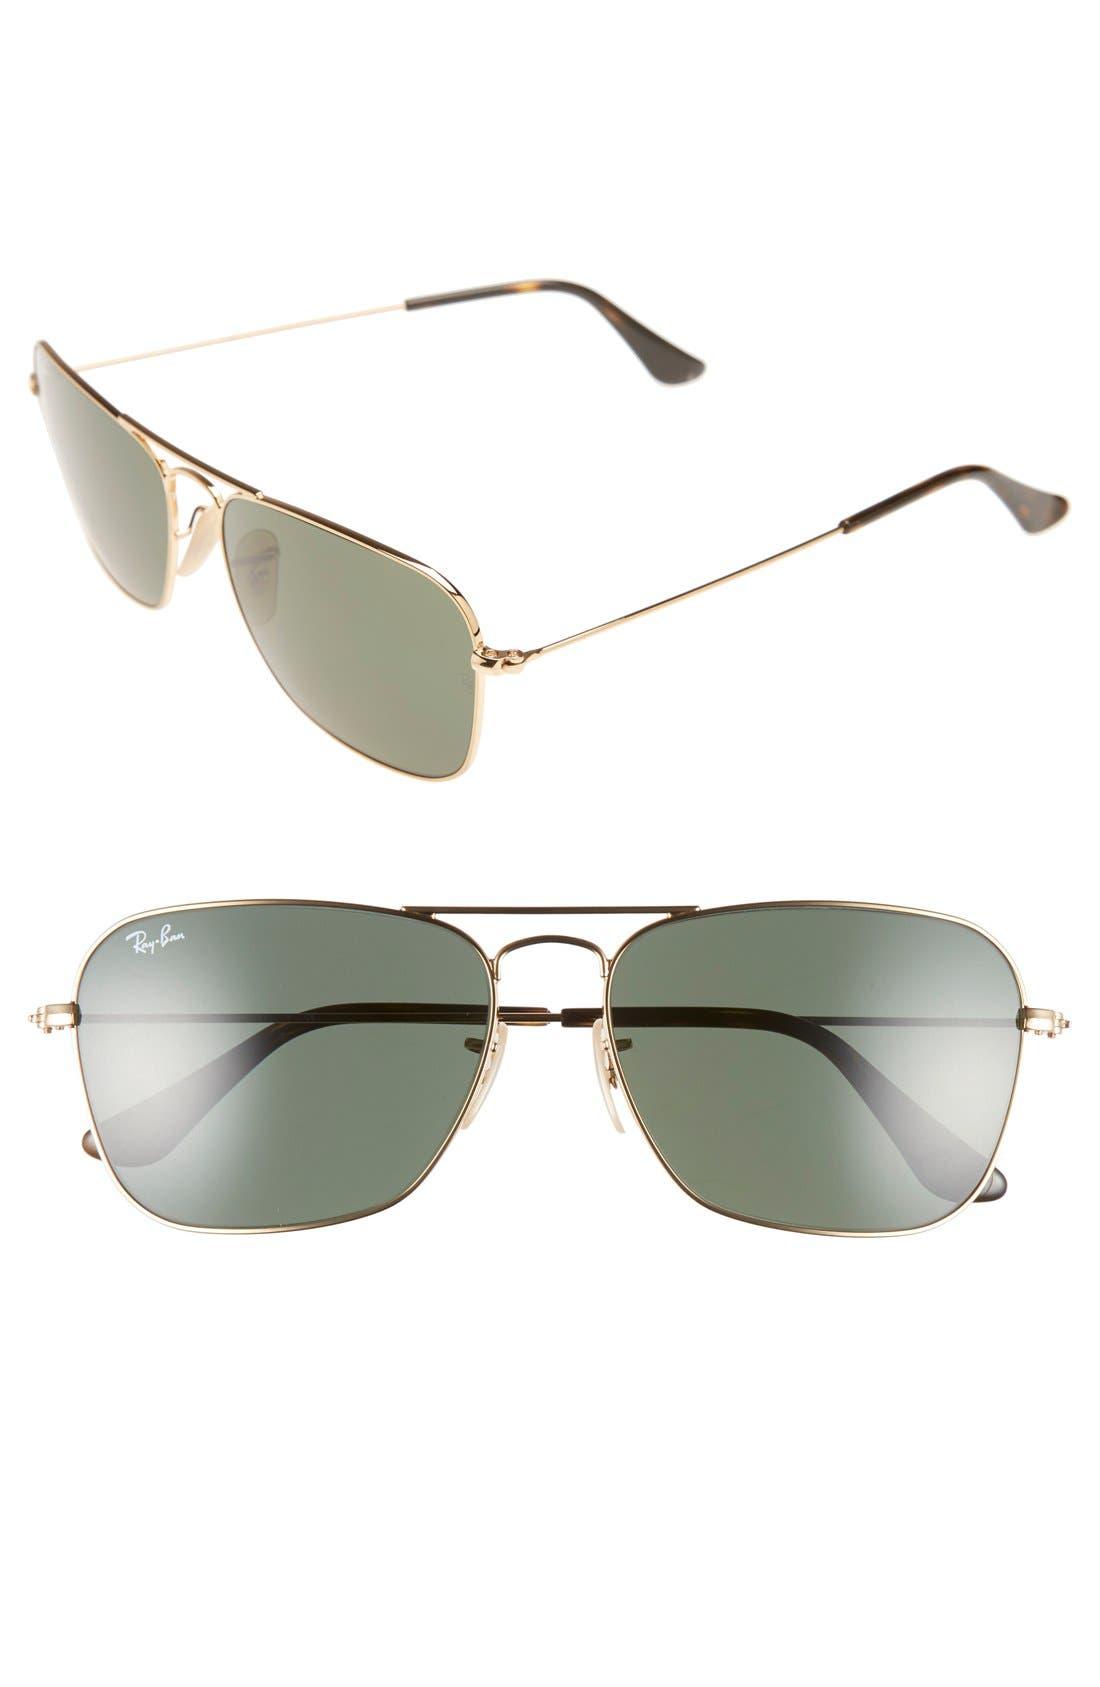 RAY-BAN, Caravan 58mm Aviator Sunglasses, Main thumbnail 1, color, GOLD/ DARK GREEN